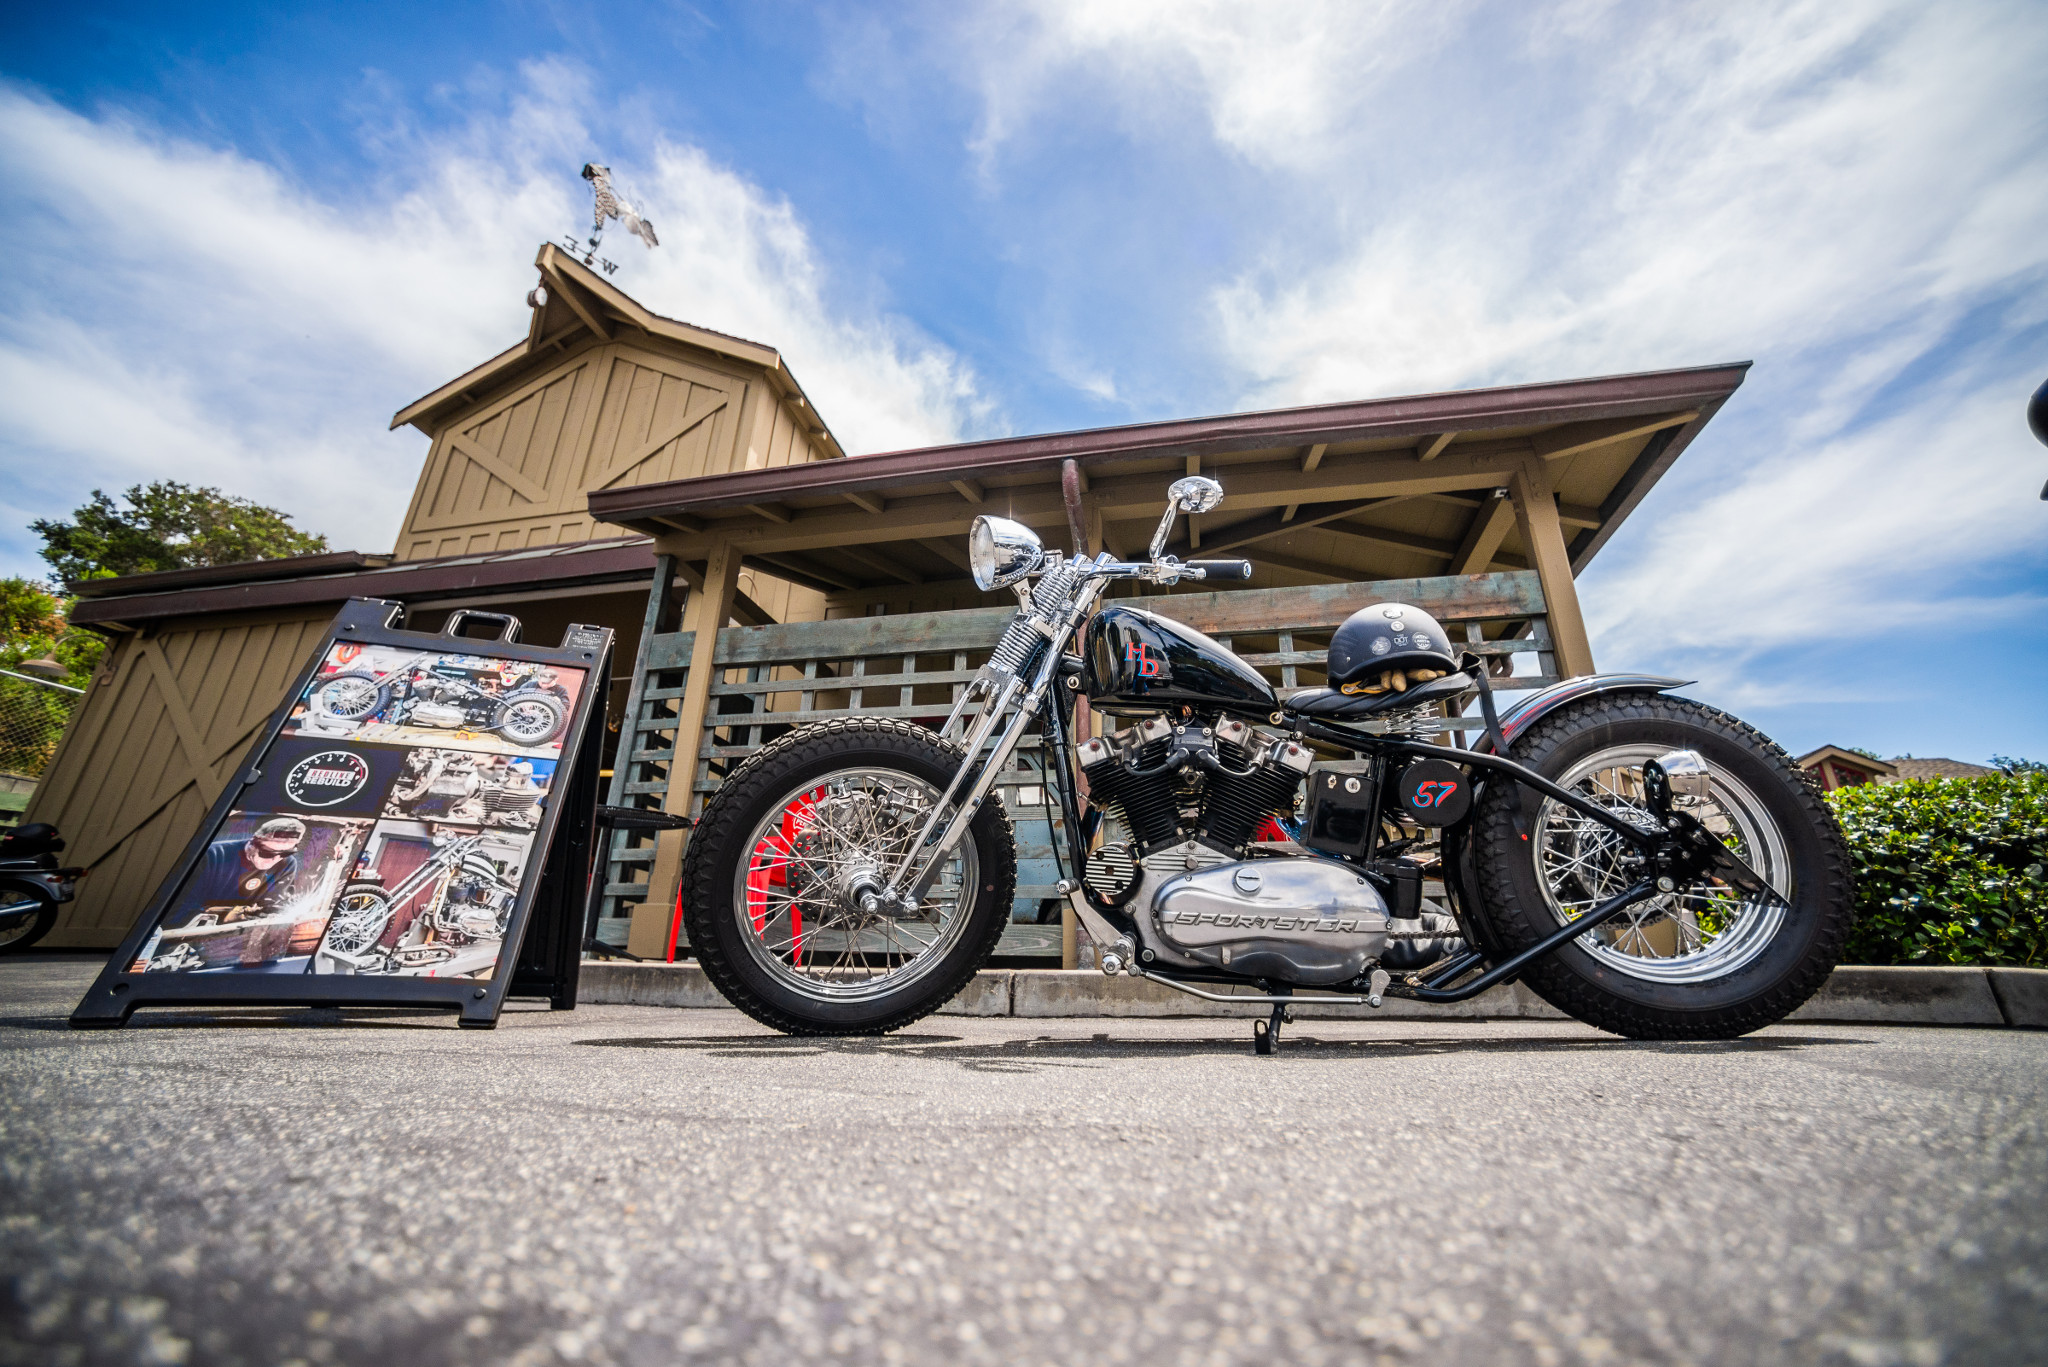 Hagerty Harley quail vintage rally